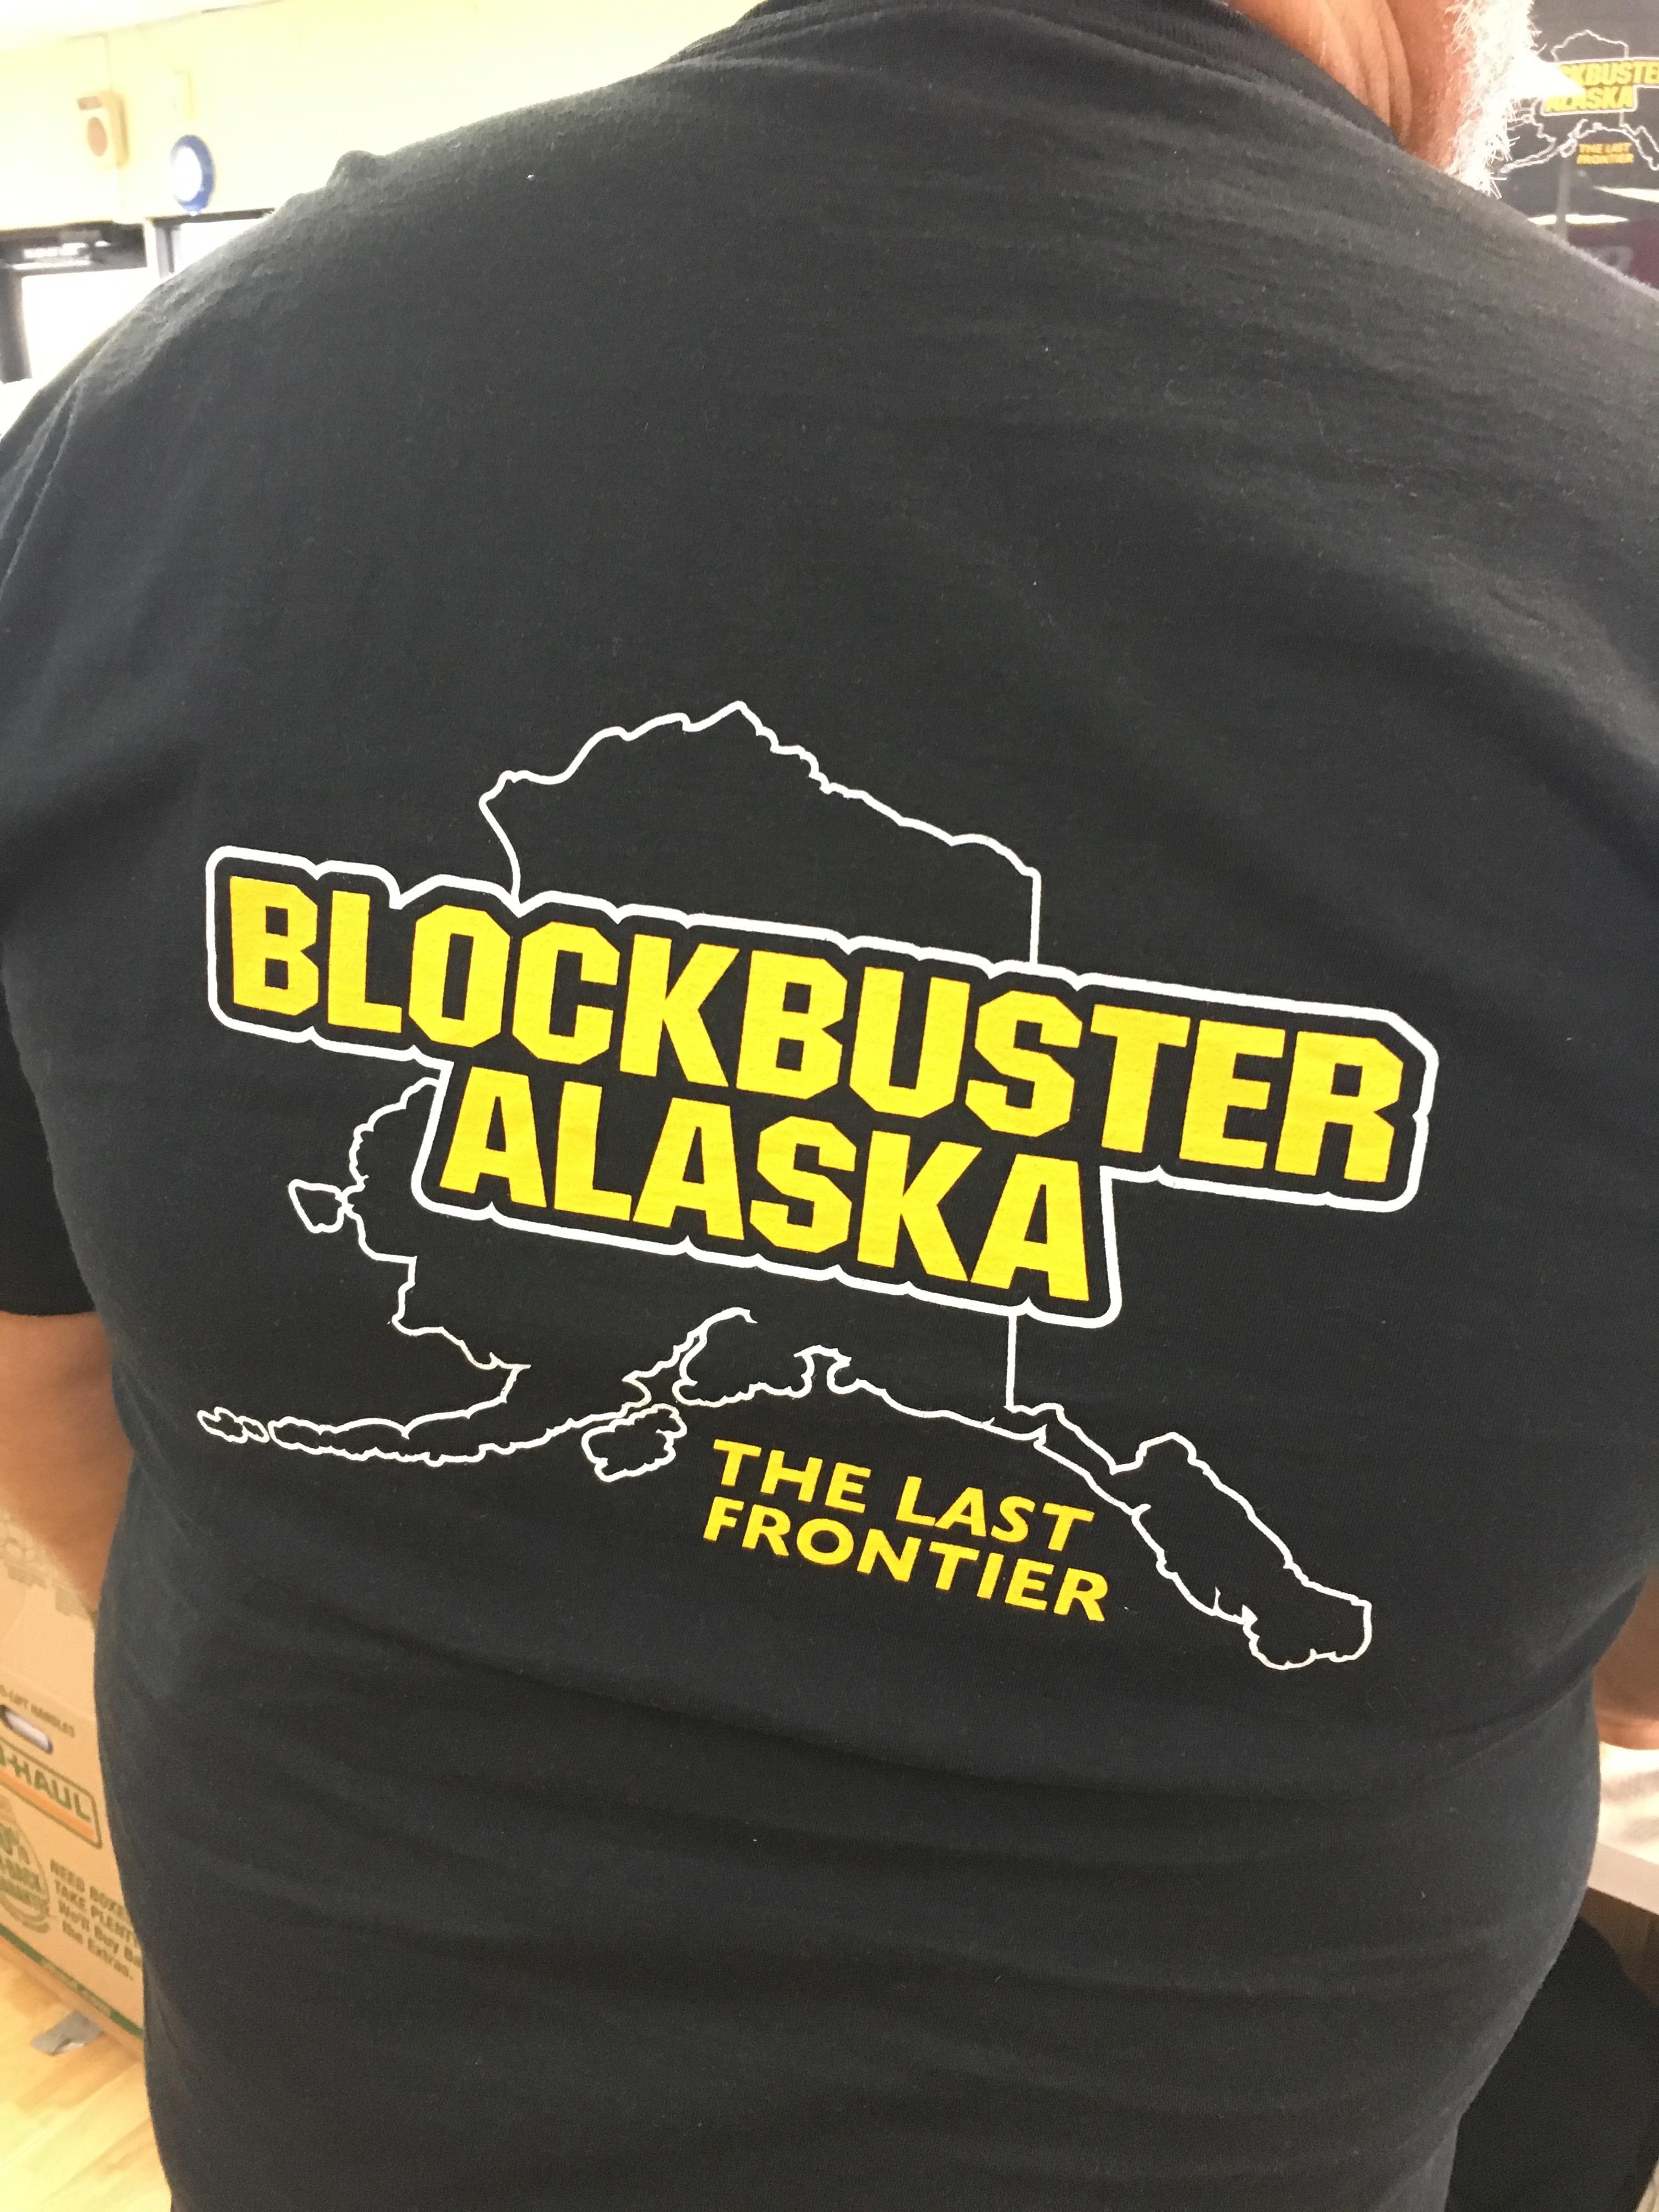 51c2ea4efb77e The Last Days of Blockbuster Video - The Ringer